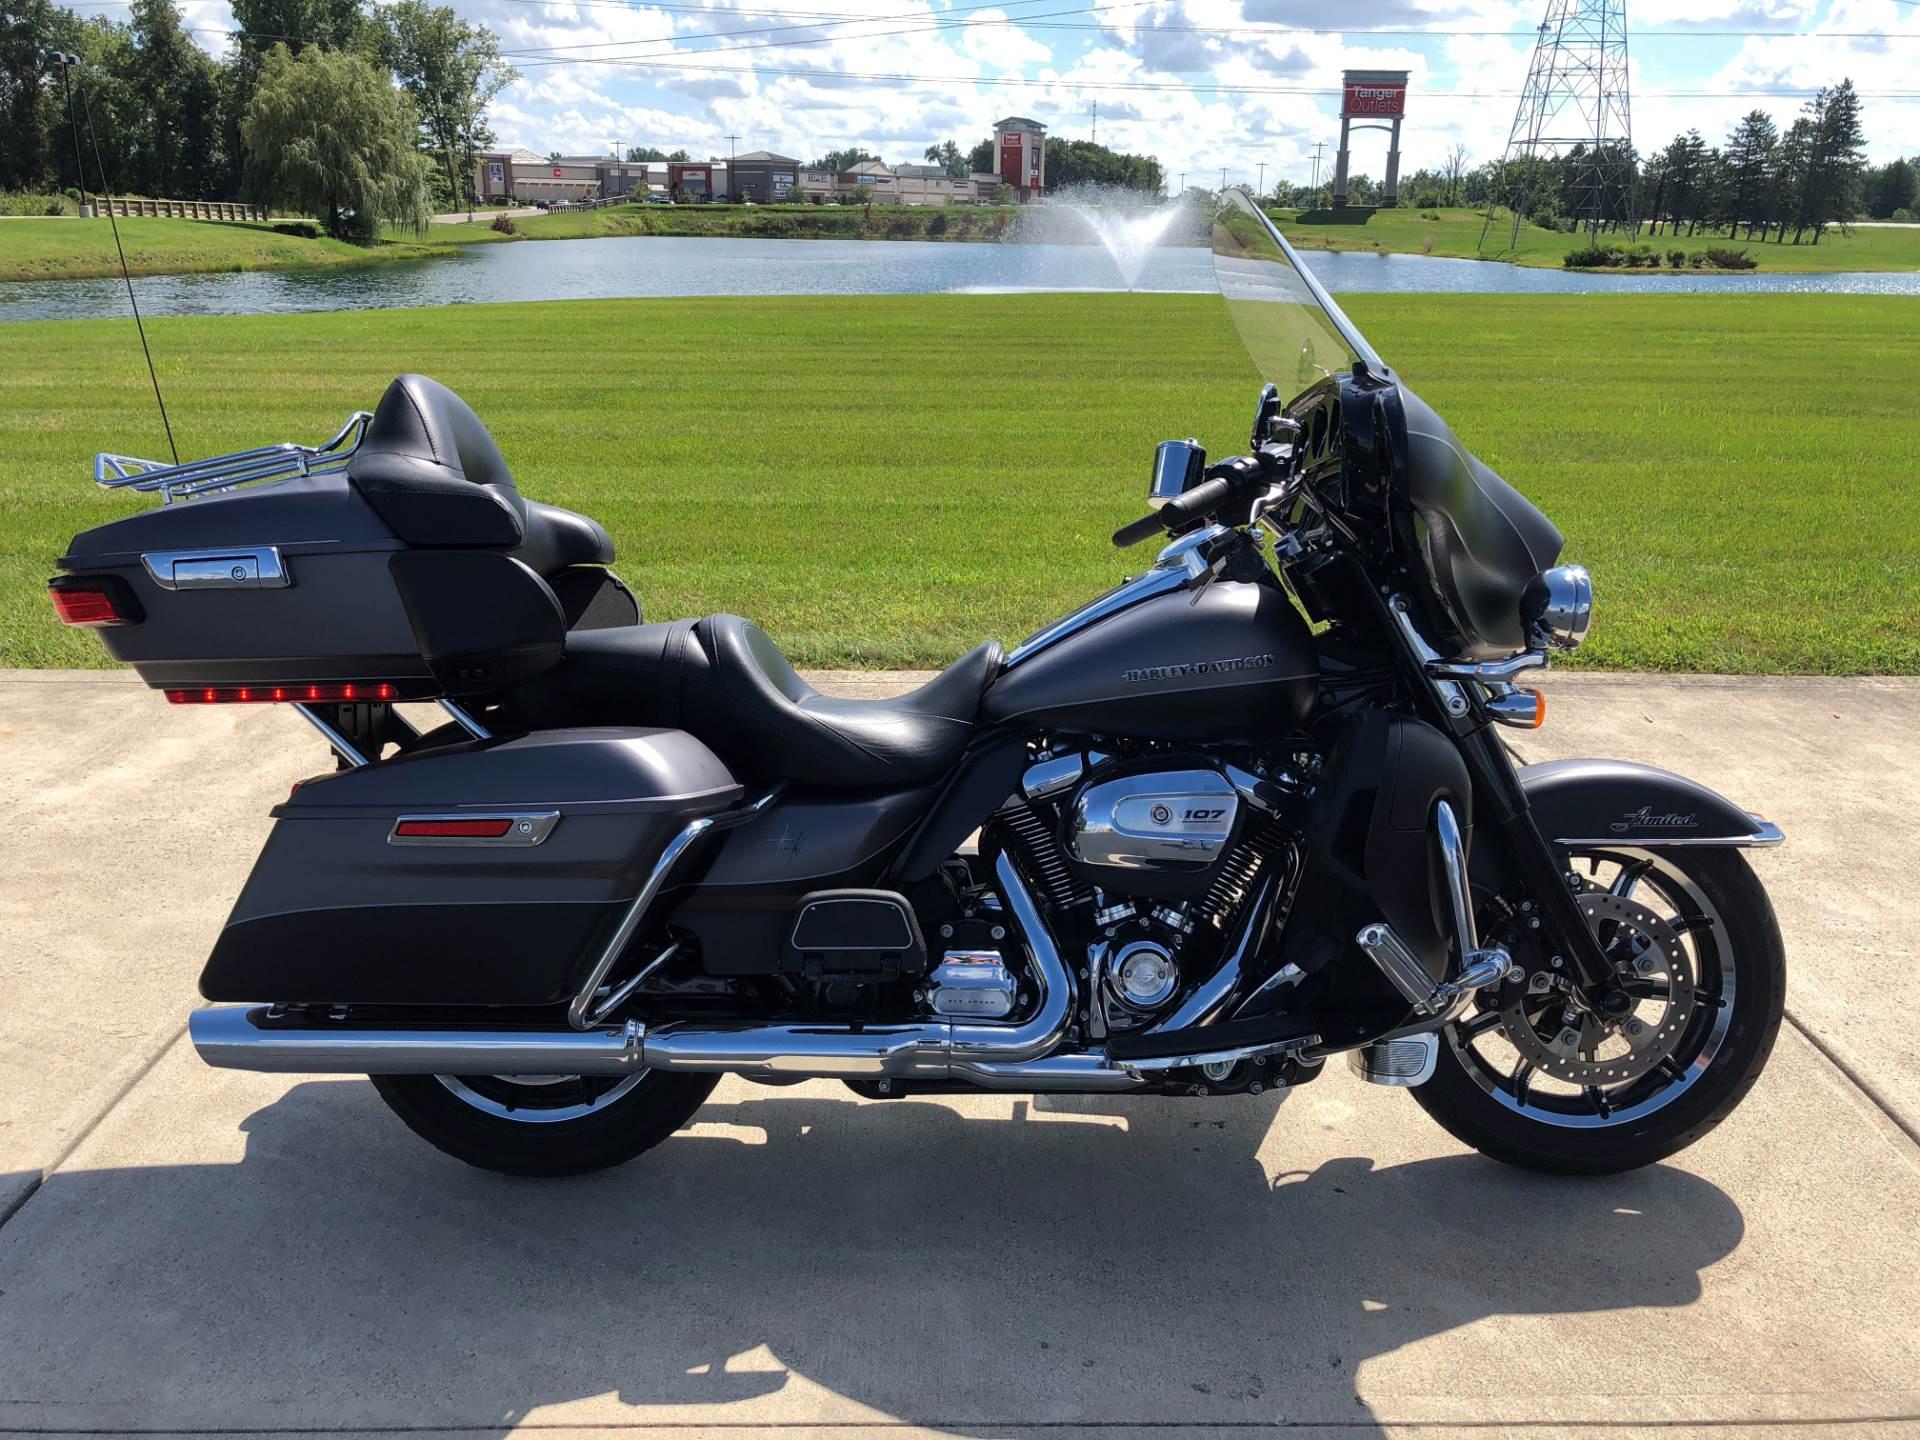 2017 Harley Davidson Ultra Limited In Sunbury Ohio